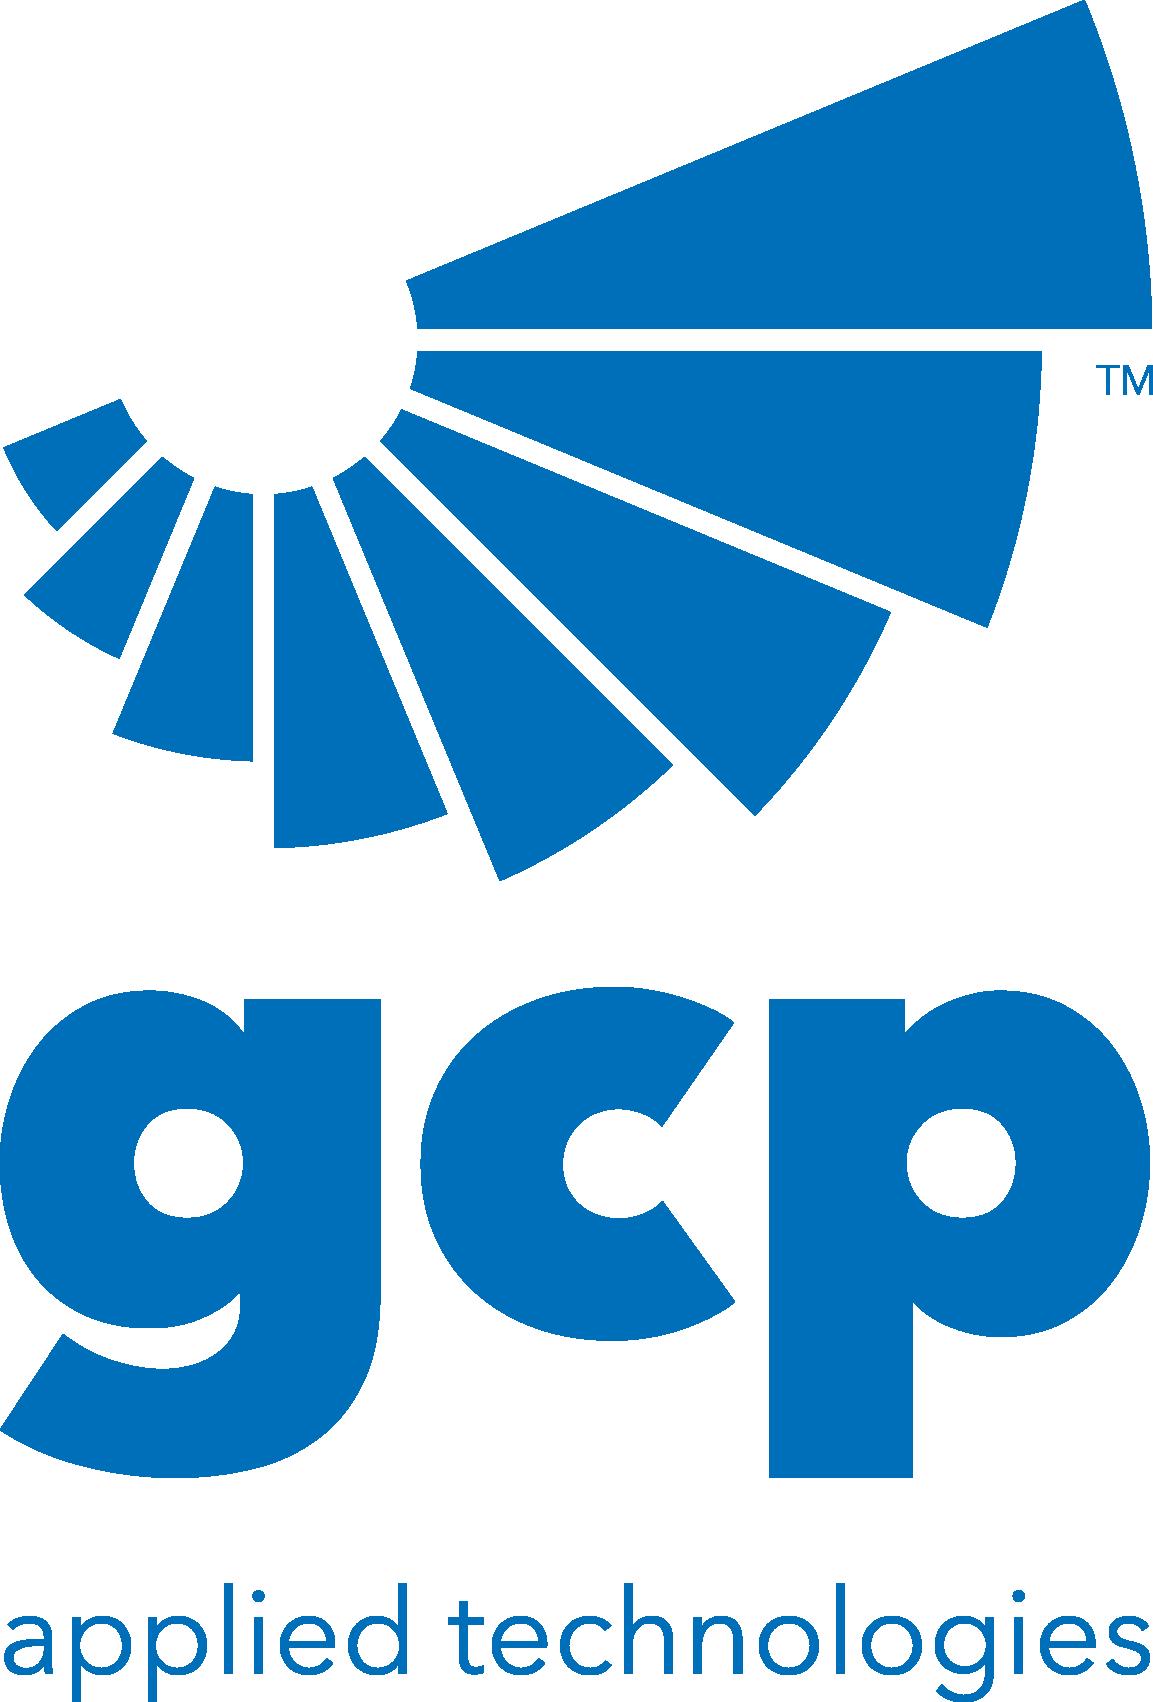 CSI - GCP Applied Technologies logo